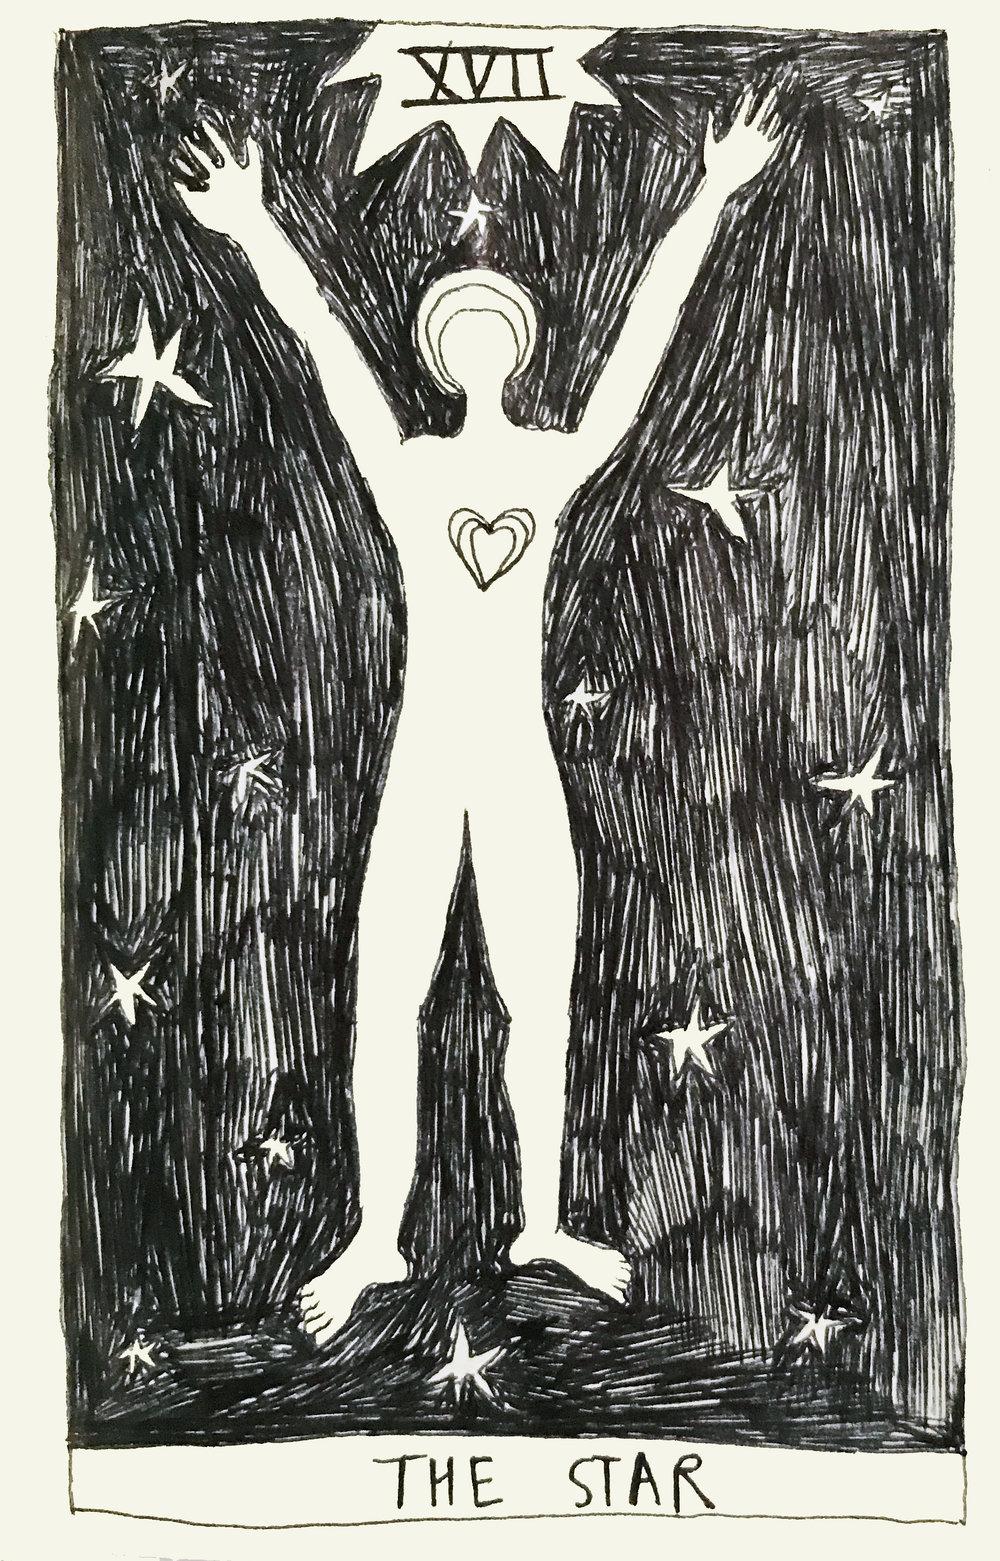 XVII: The Star